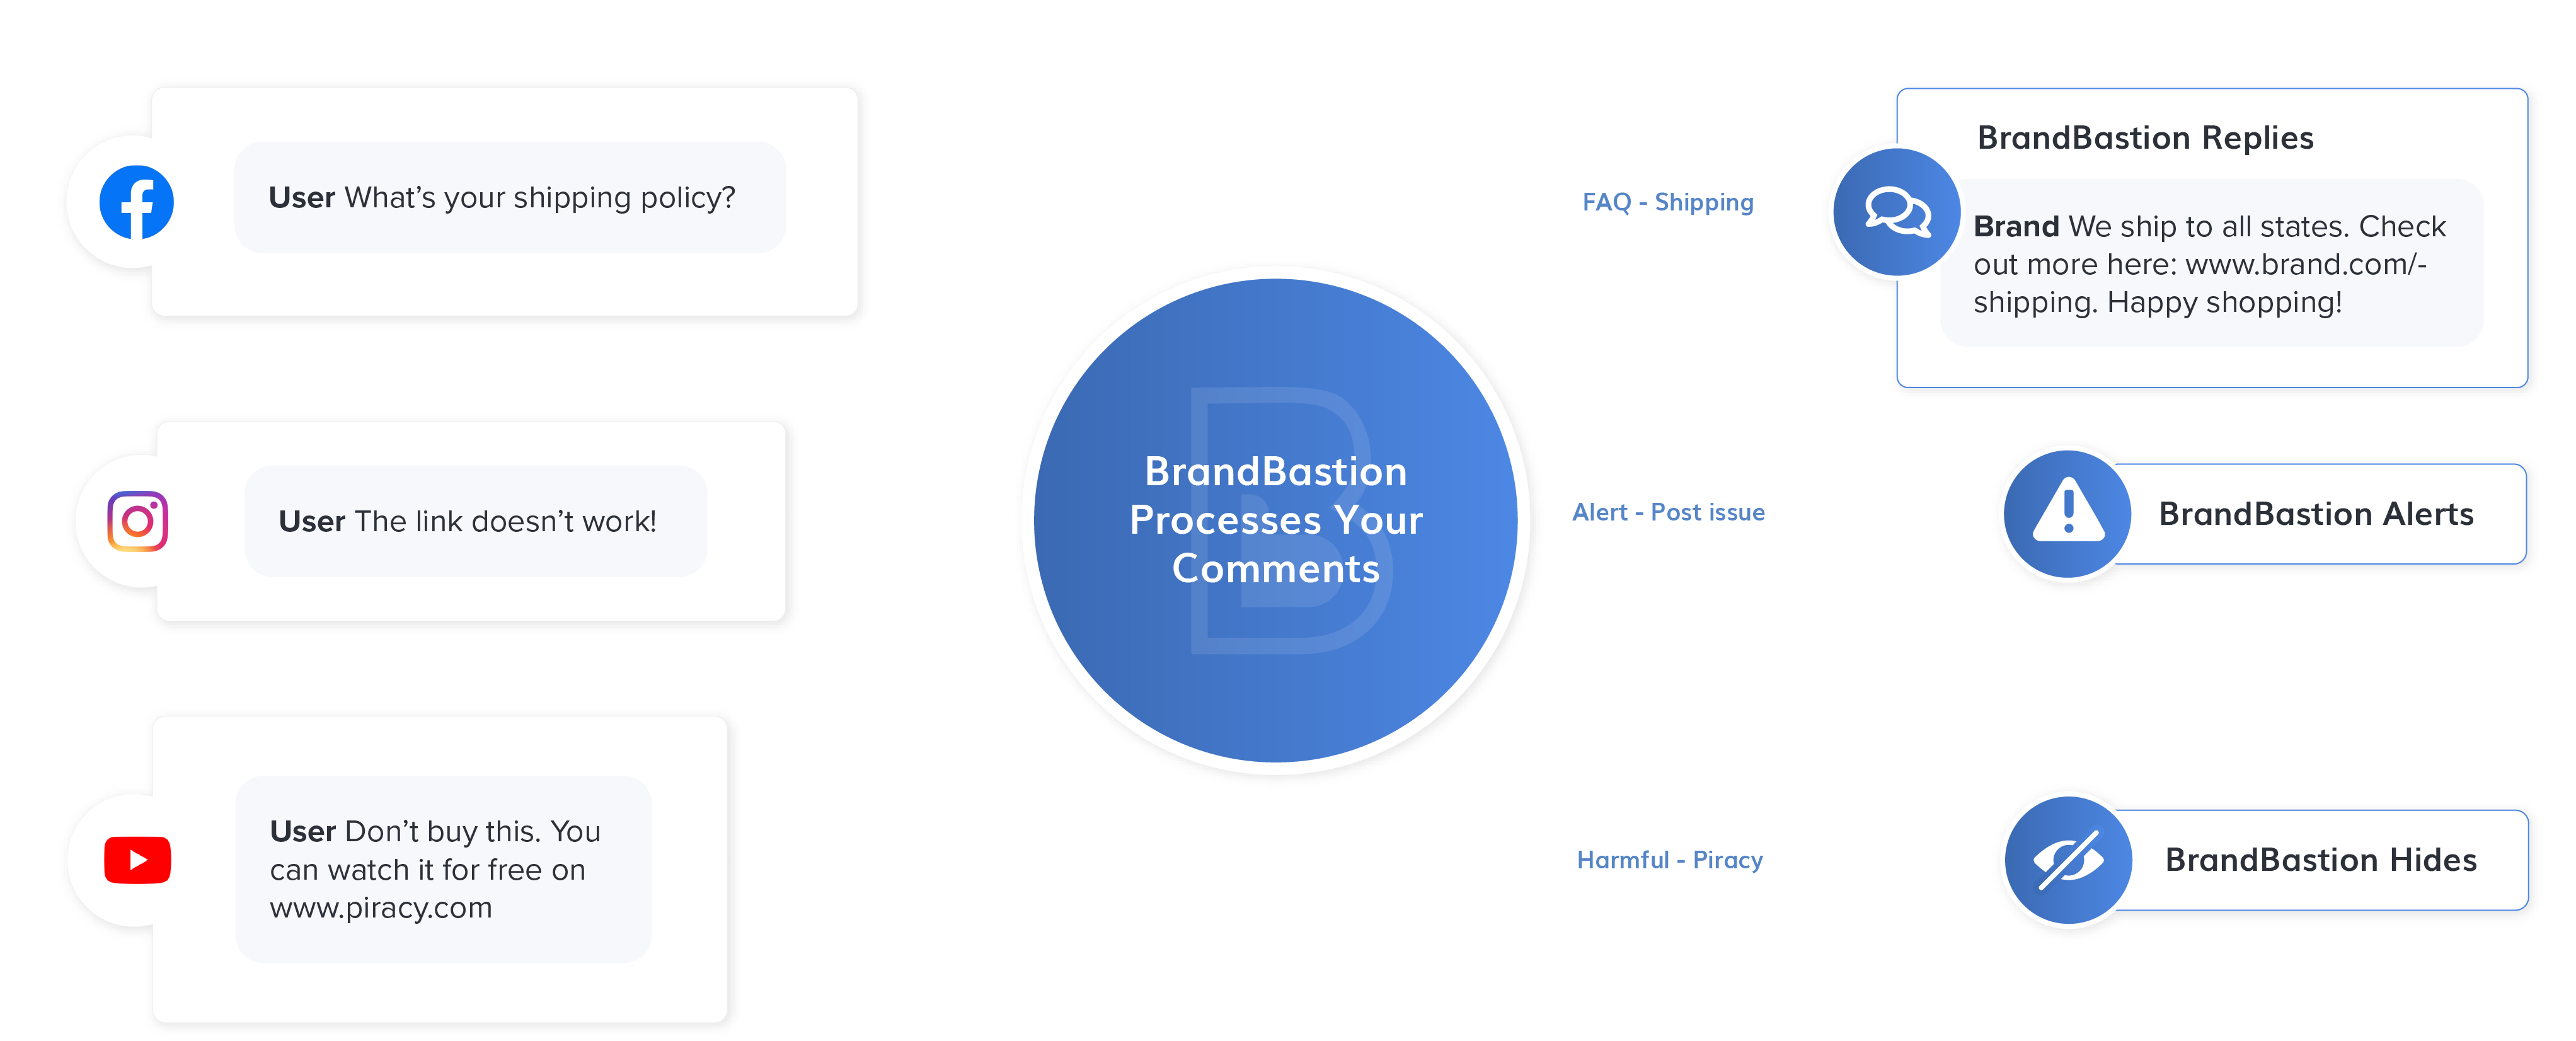 BrandBastion AI + Human Solutions